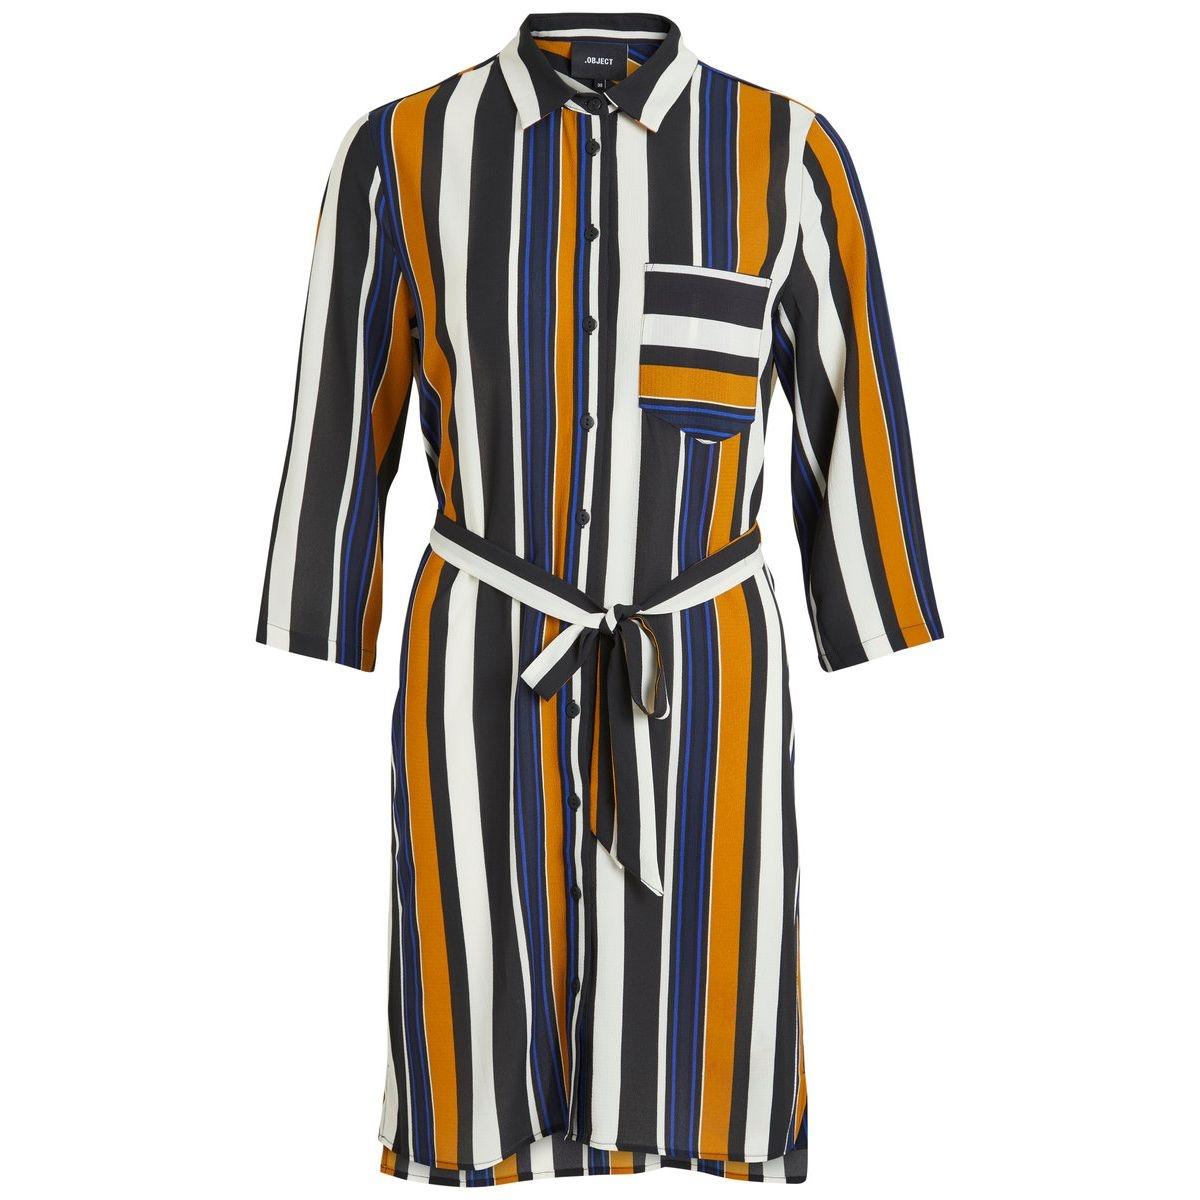 Robe À rayures, chemise